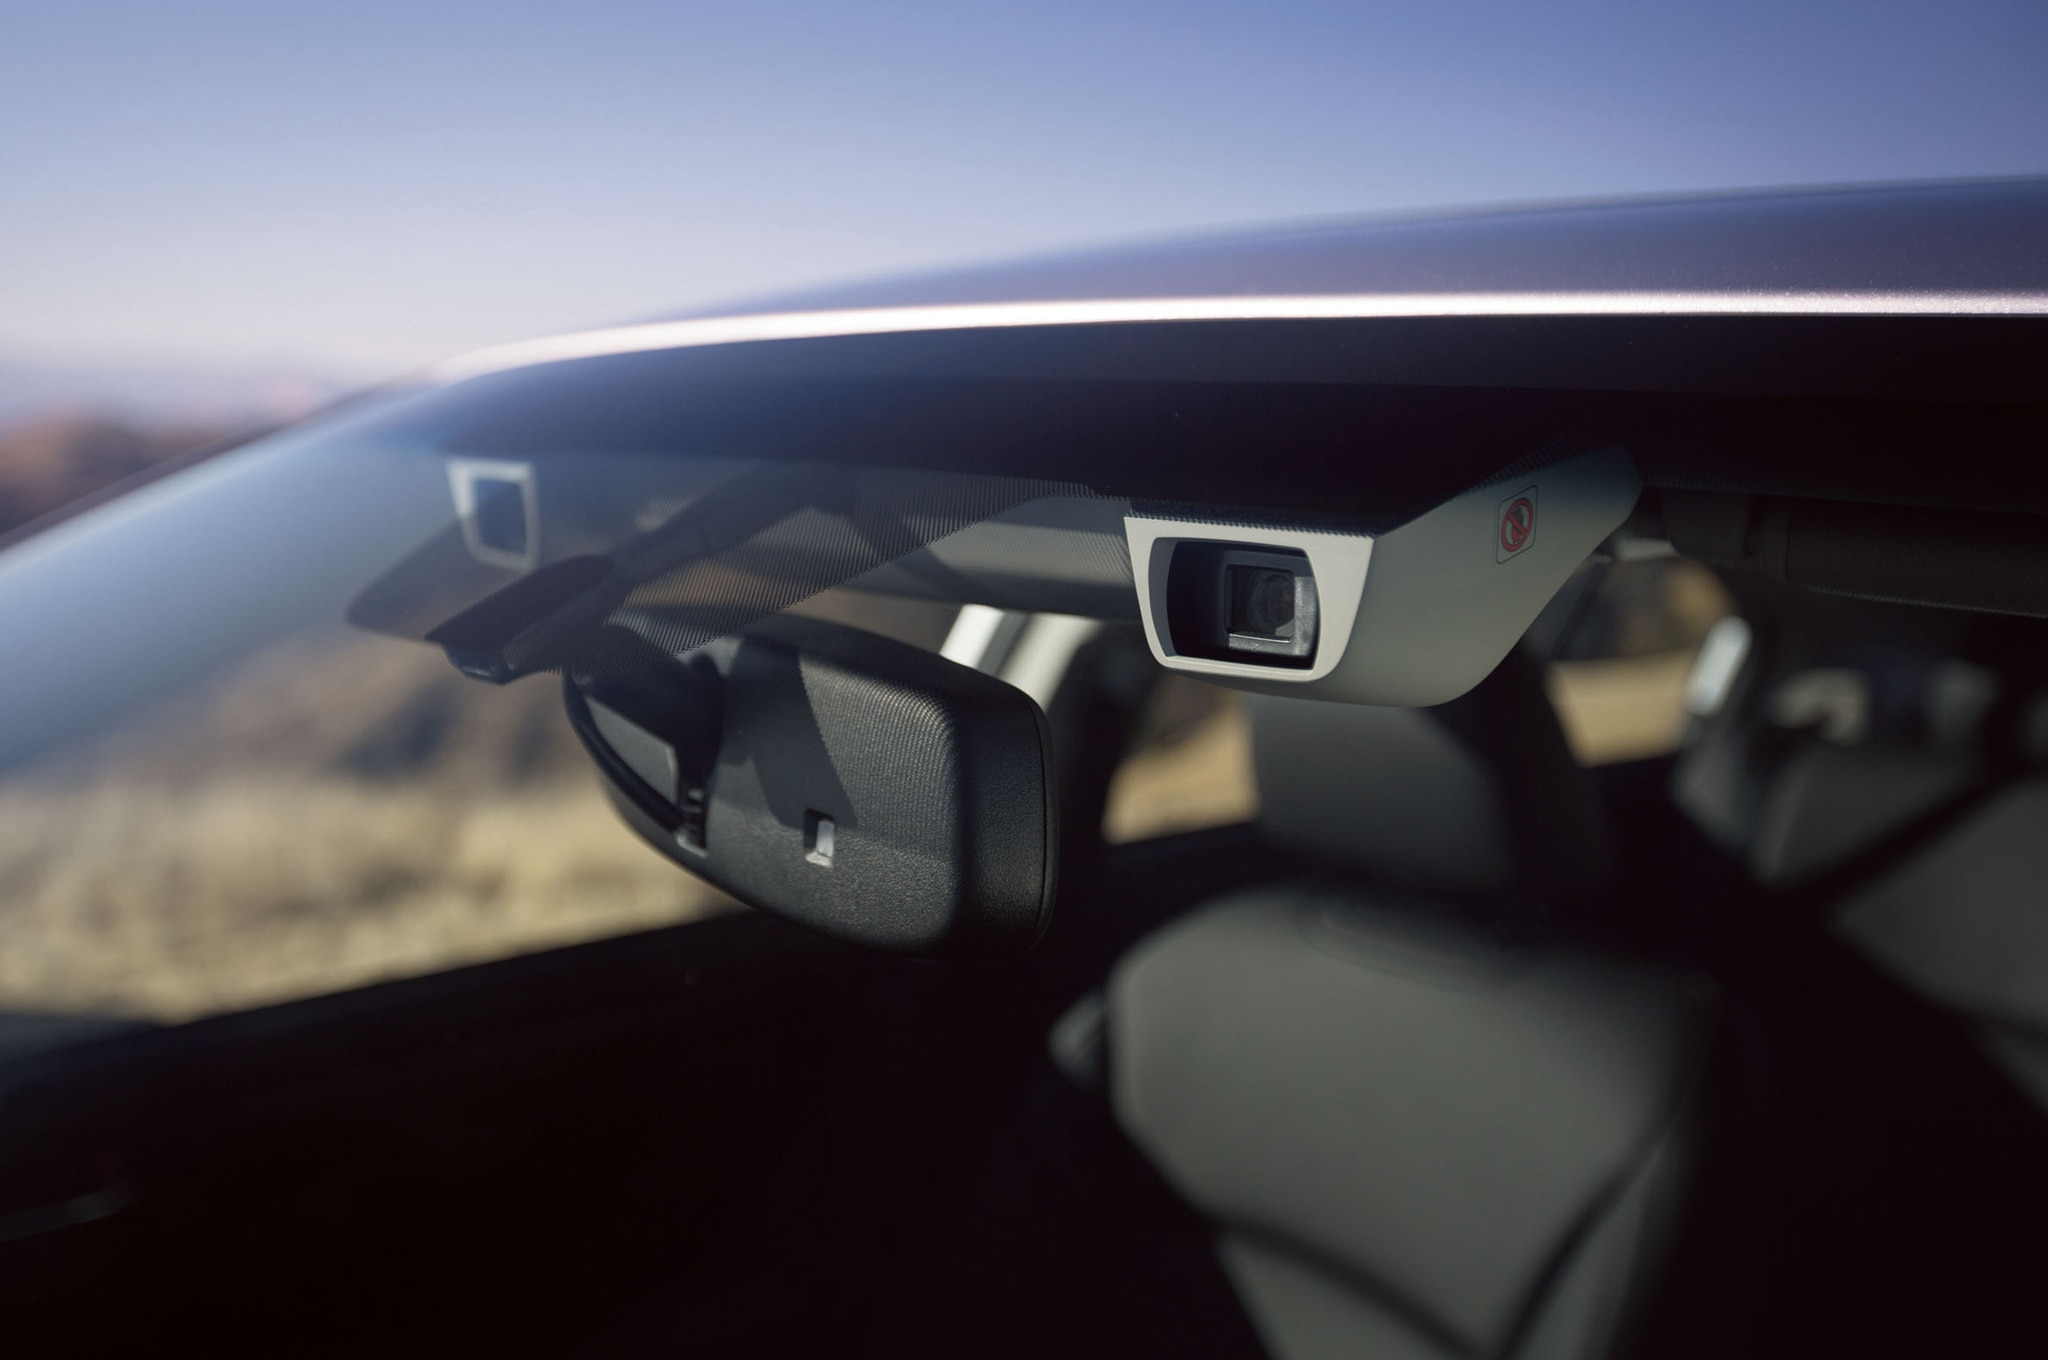 2015 Subaru Eyesight Camera System1